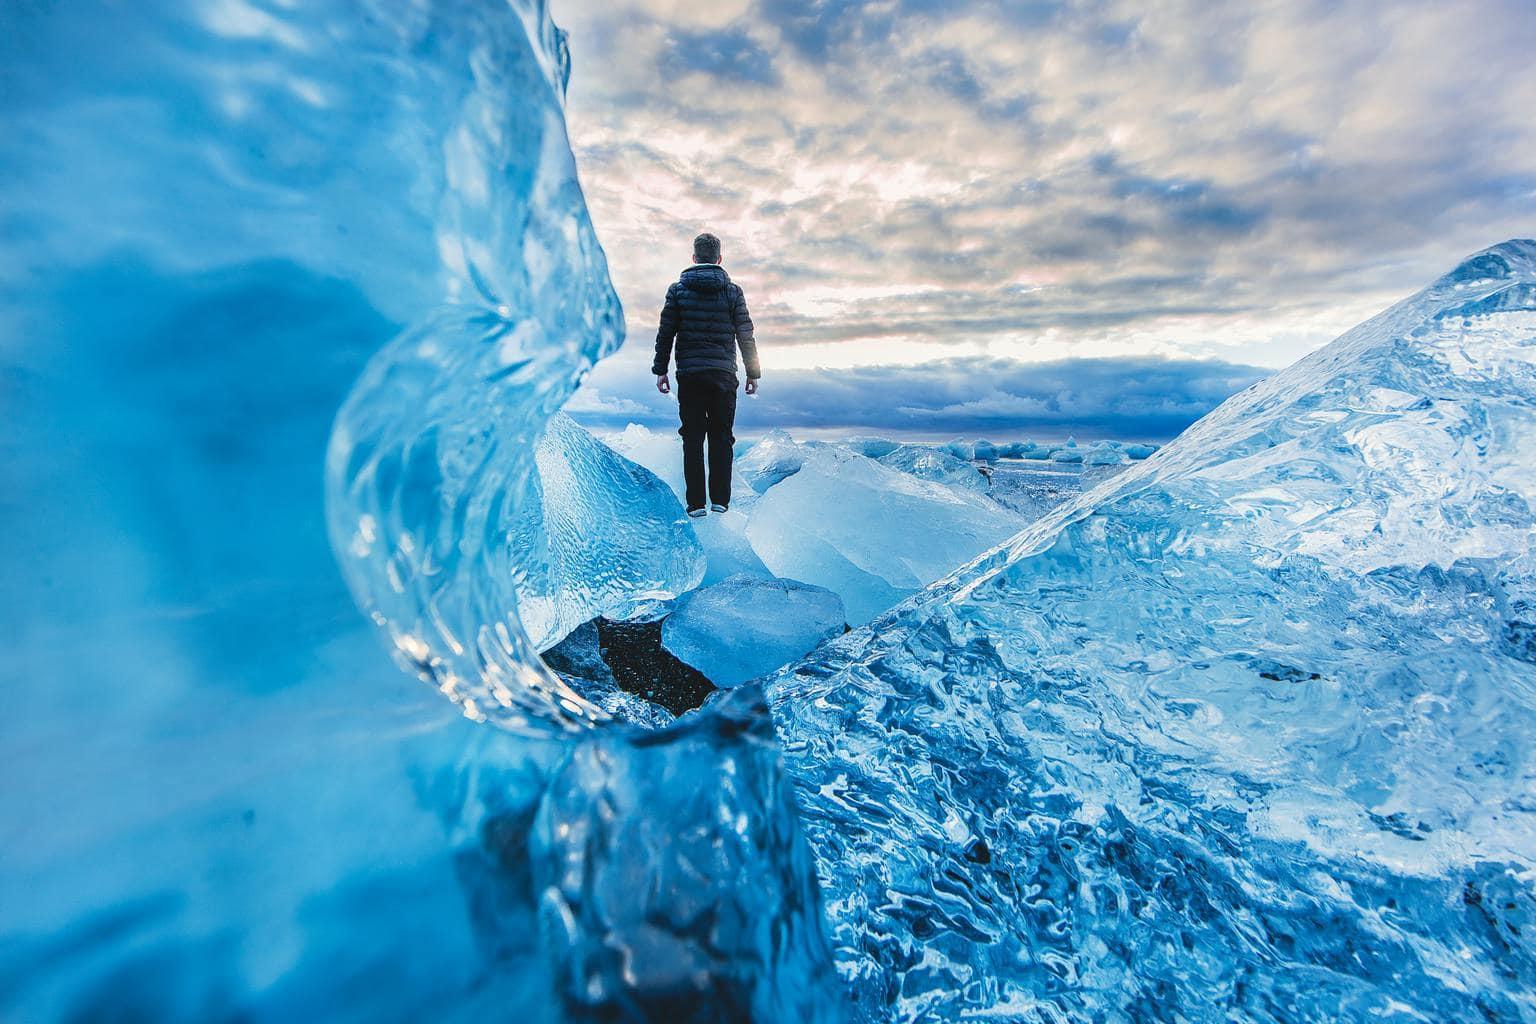 persona hielo naturaleza